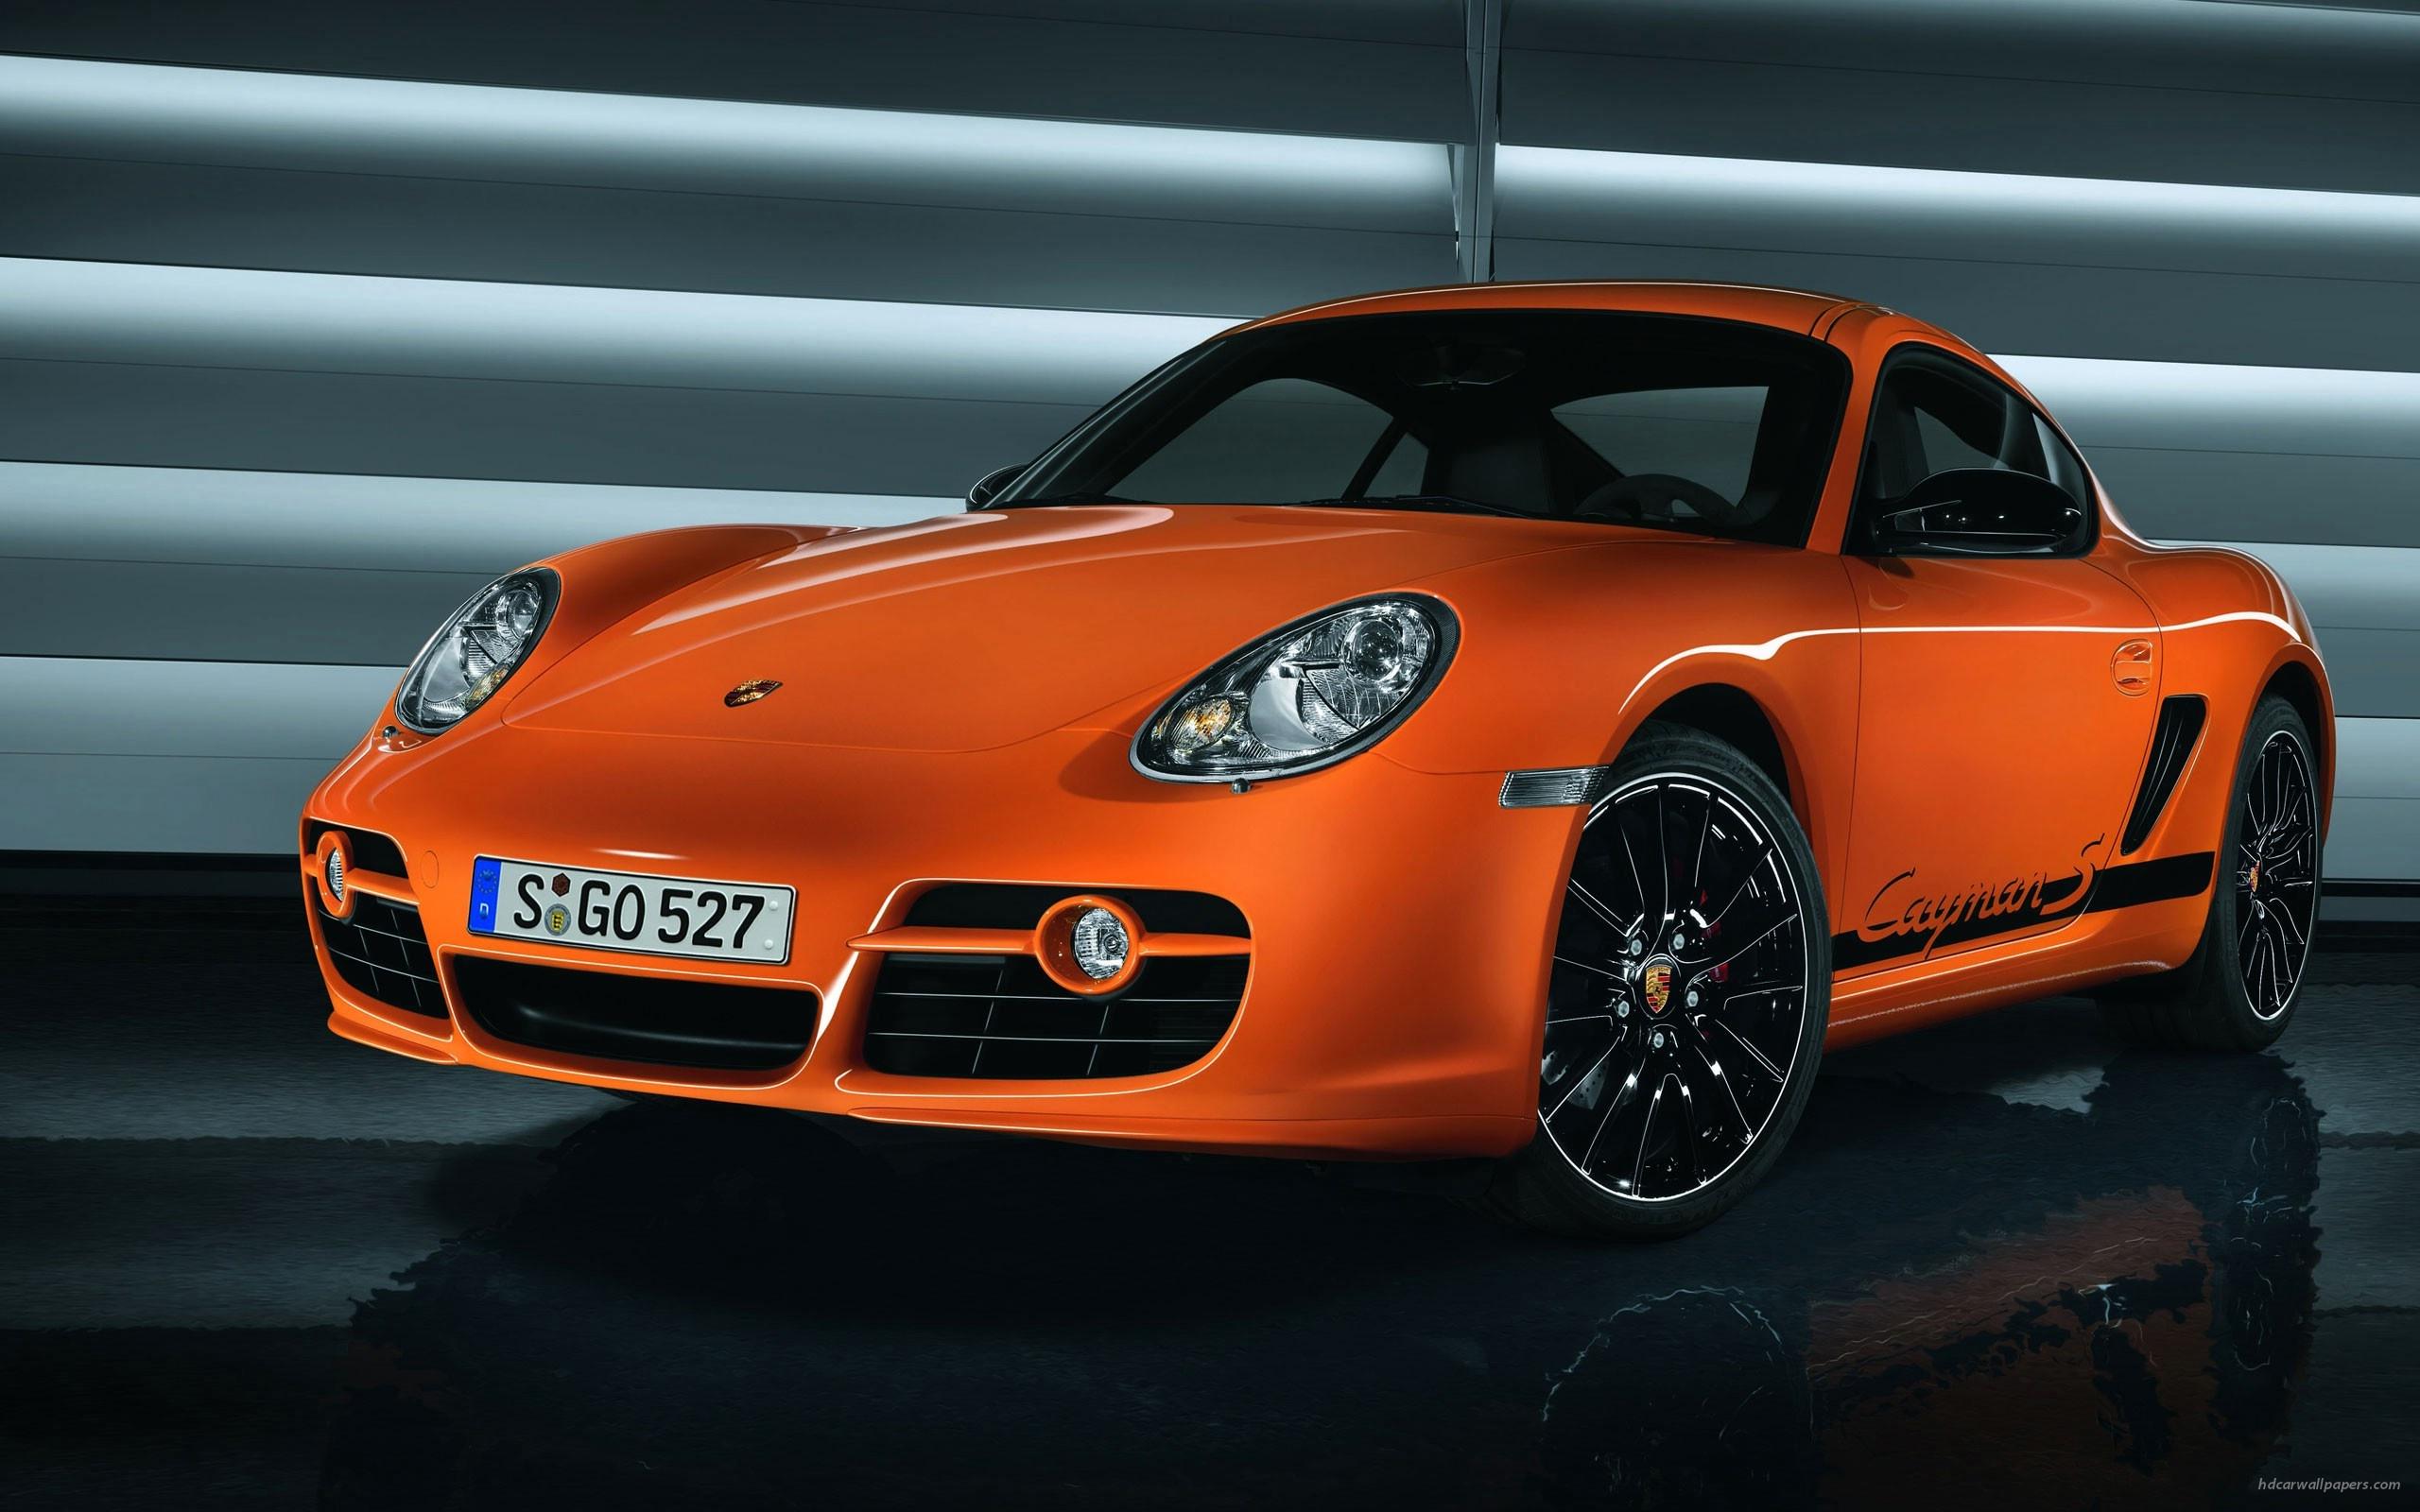 Porsche Cayman S Sport Hd Wallpapers In Jpg Format For Free Download